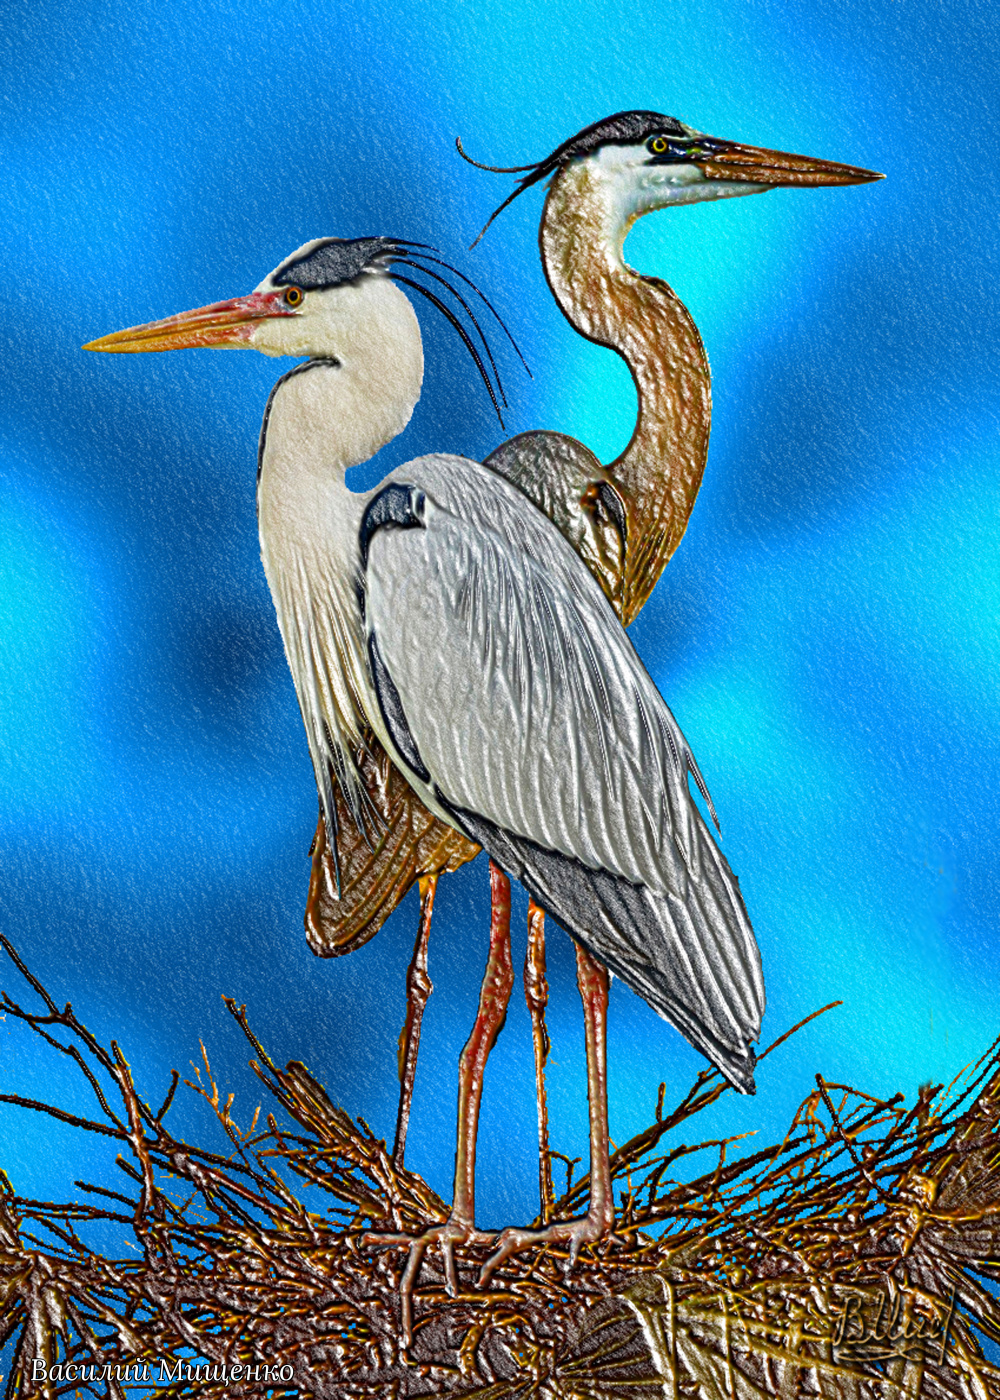 Vasiliy Mishchenko. Herons in the nest